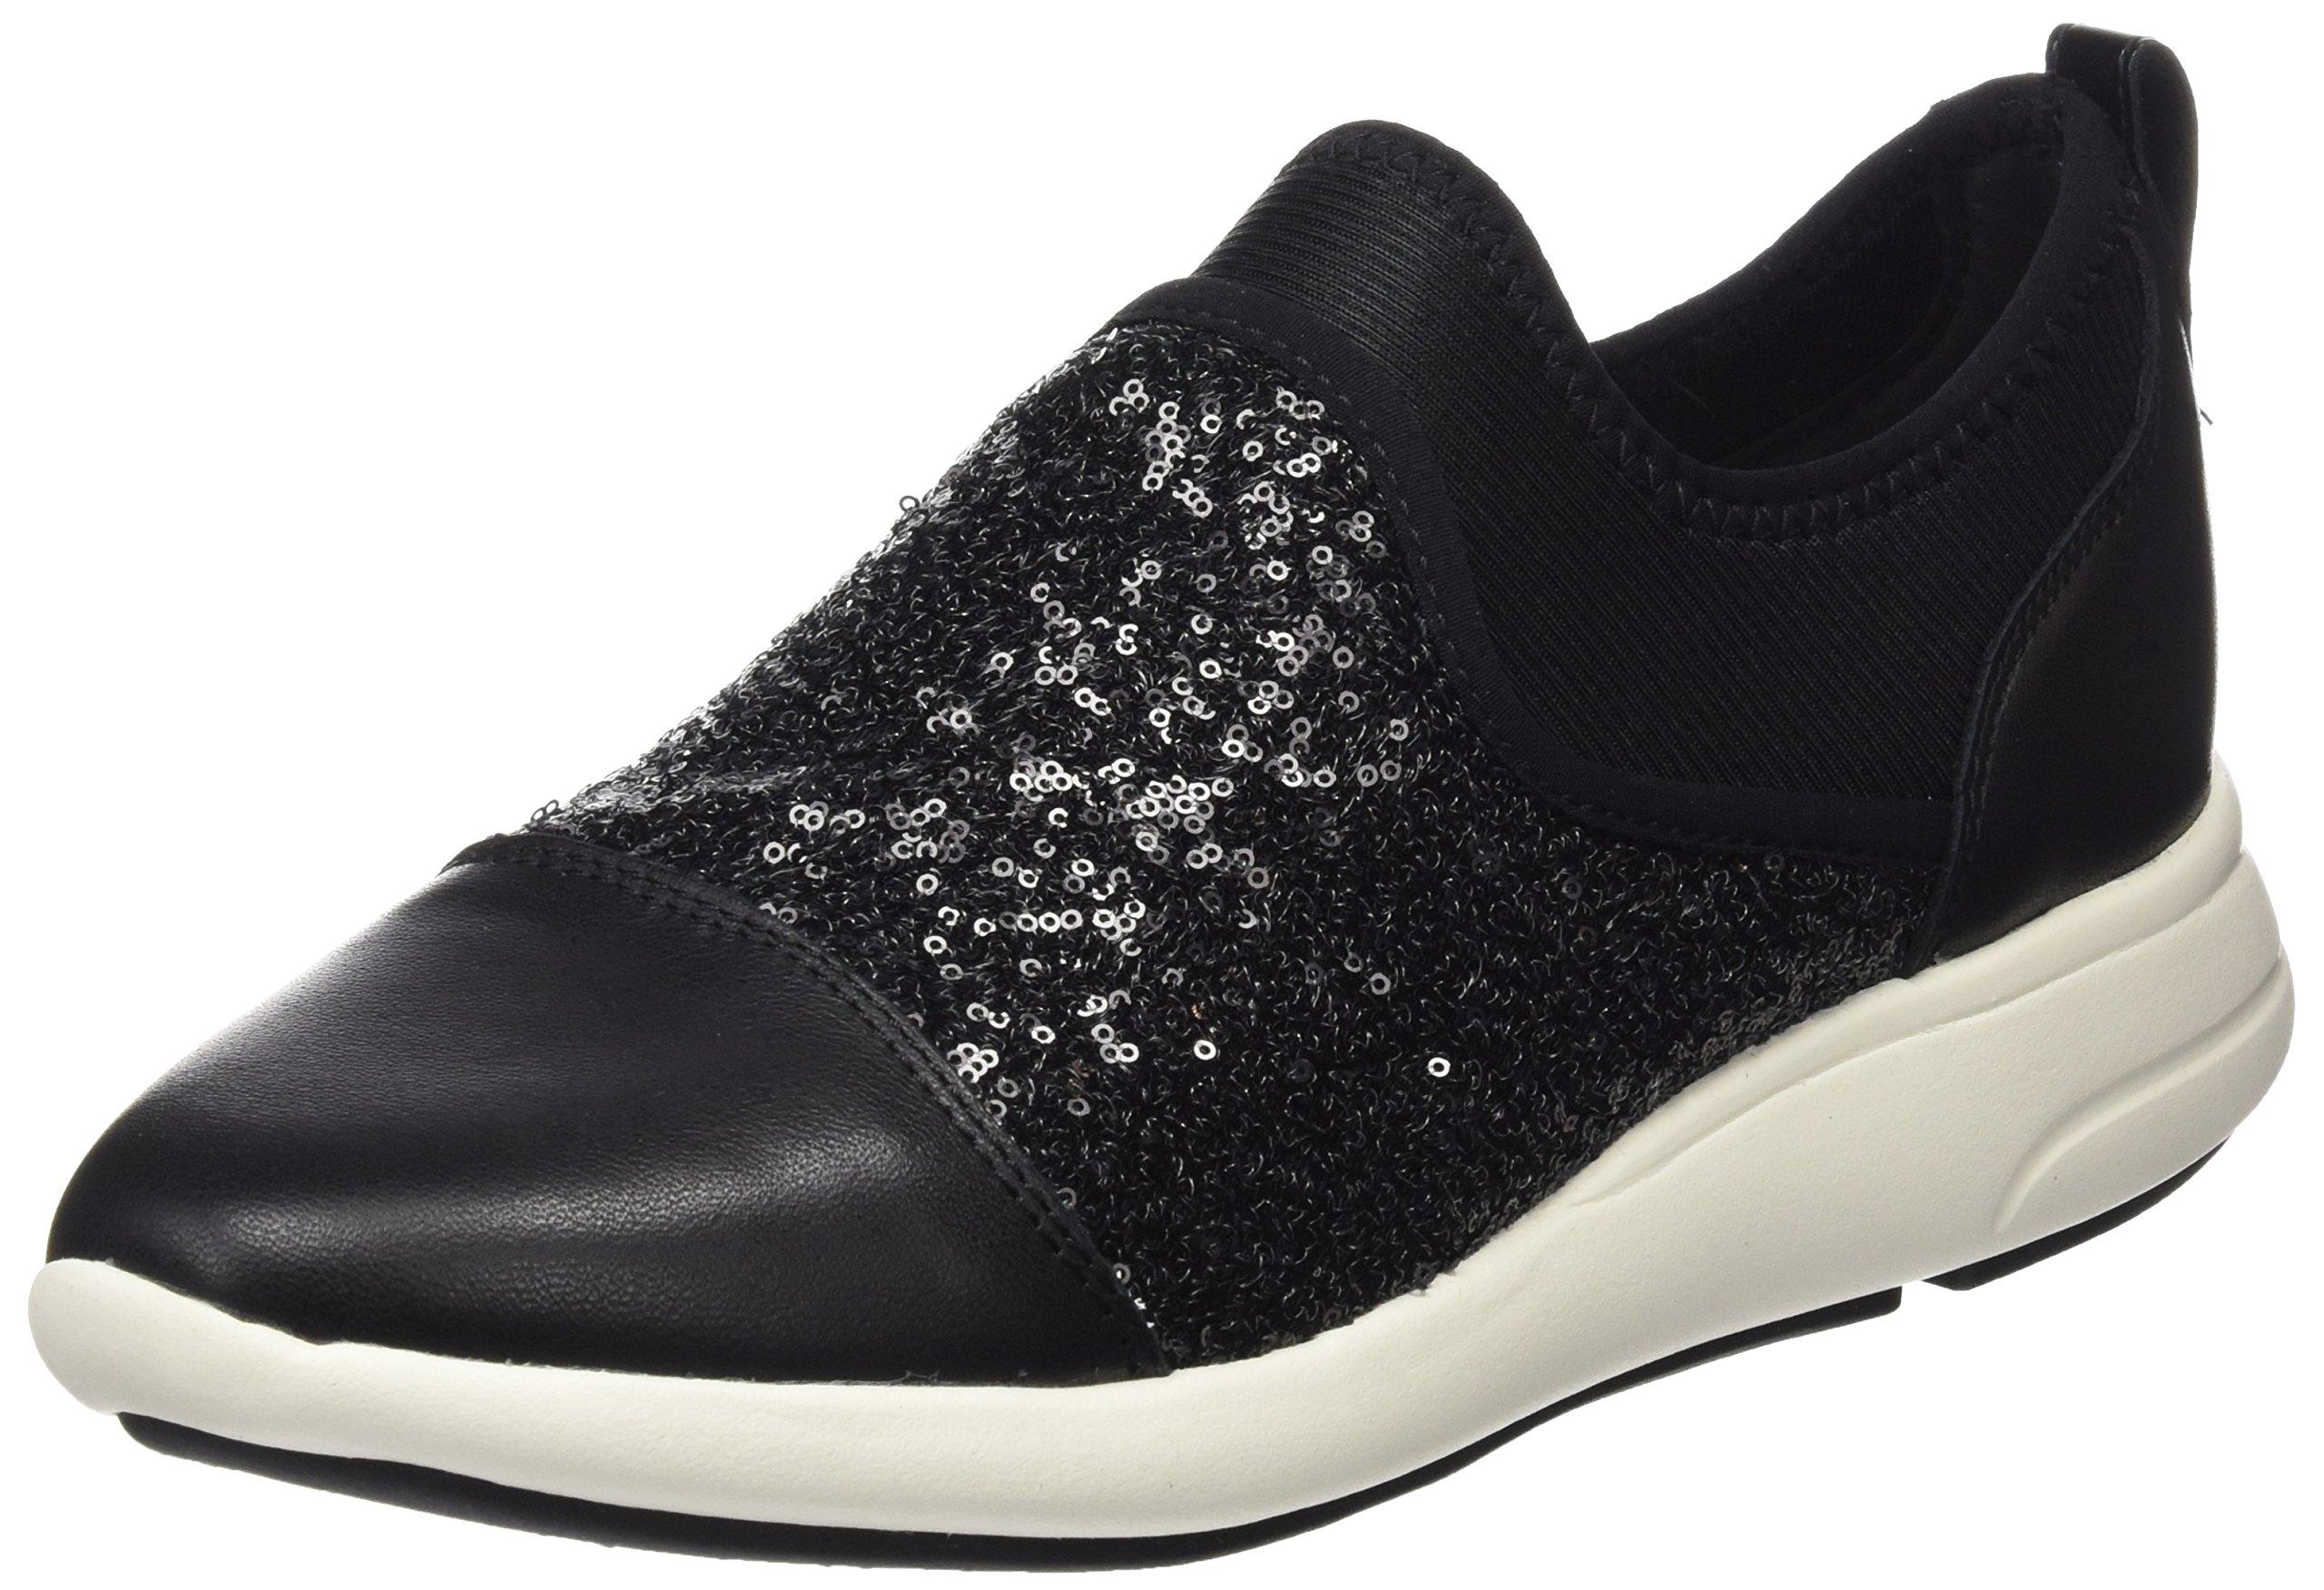 Geox Ophira BSneakers Eu D Basses FemmeNoirblack39 YEDHW29I